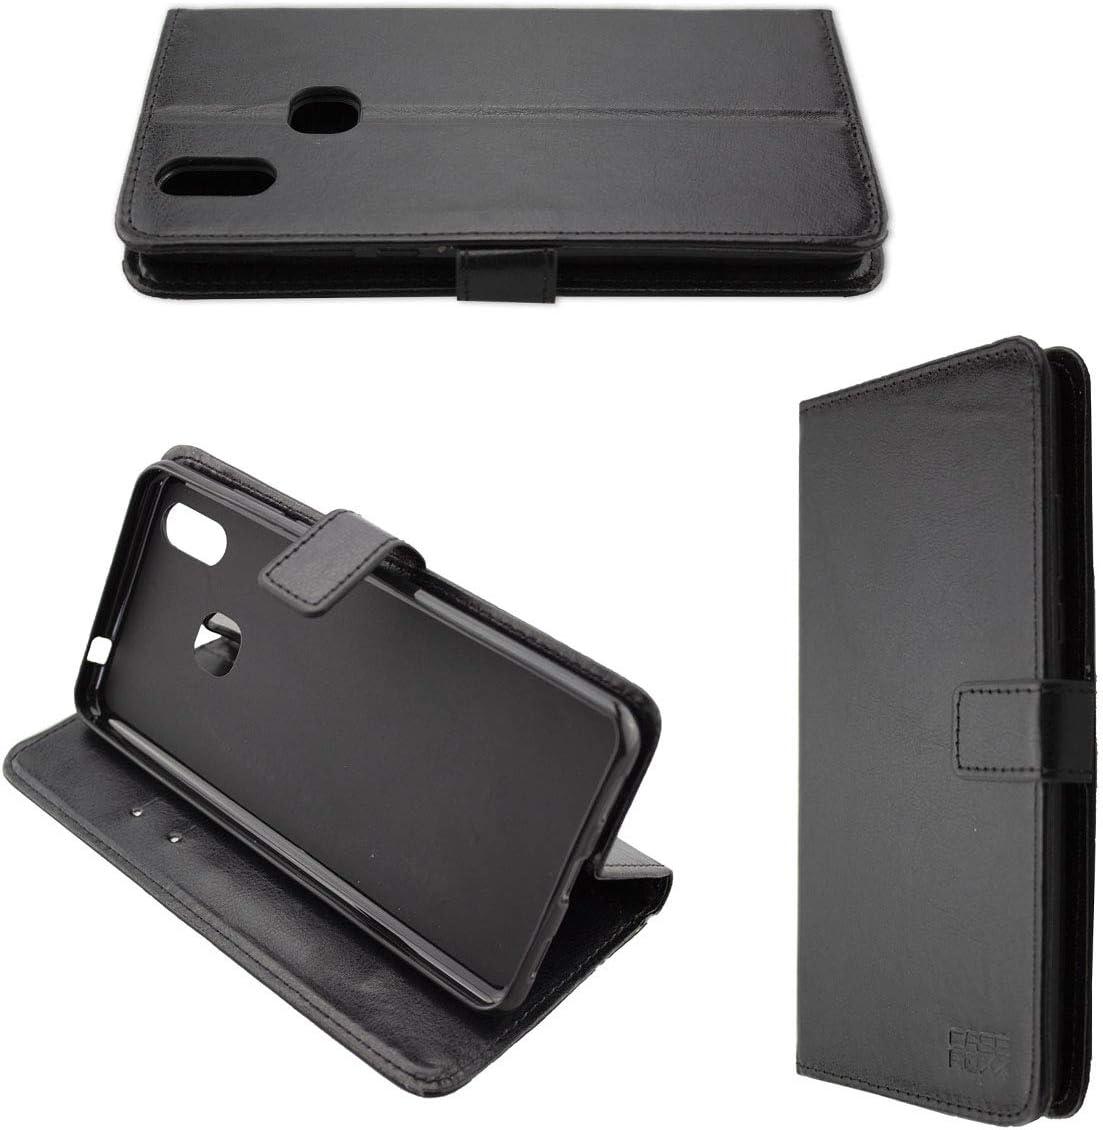 Casco para Cubot MAX 2, Bookstyle-Case Funda Protectora a Prueba de Golpes para Smartphone (Carcasa de Color Negro): Amazon.es: Electrónica